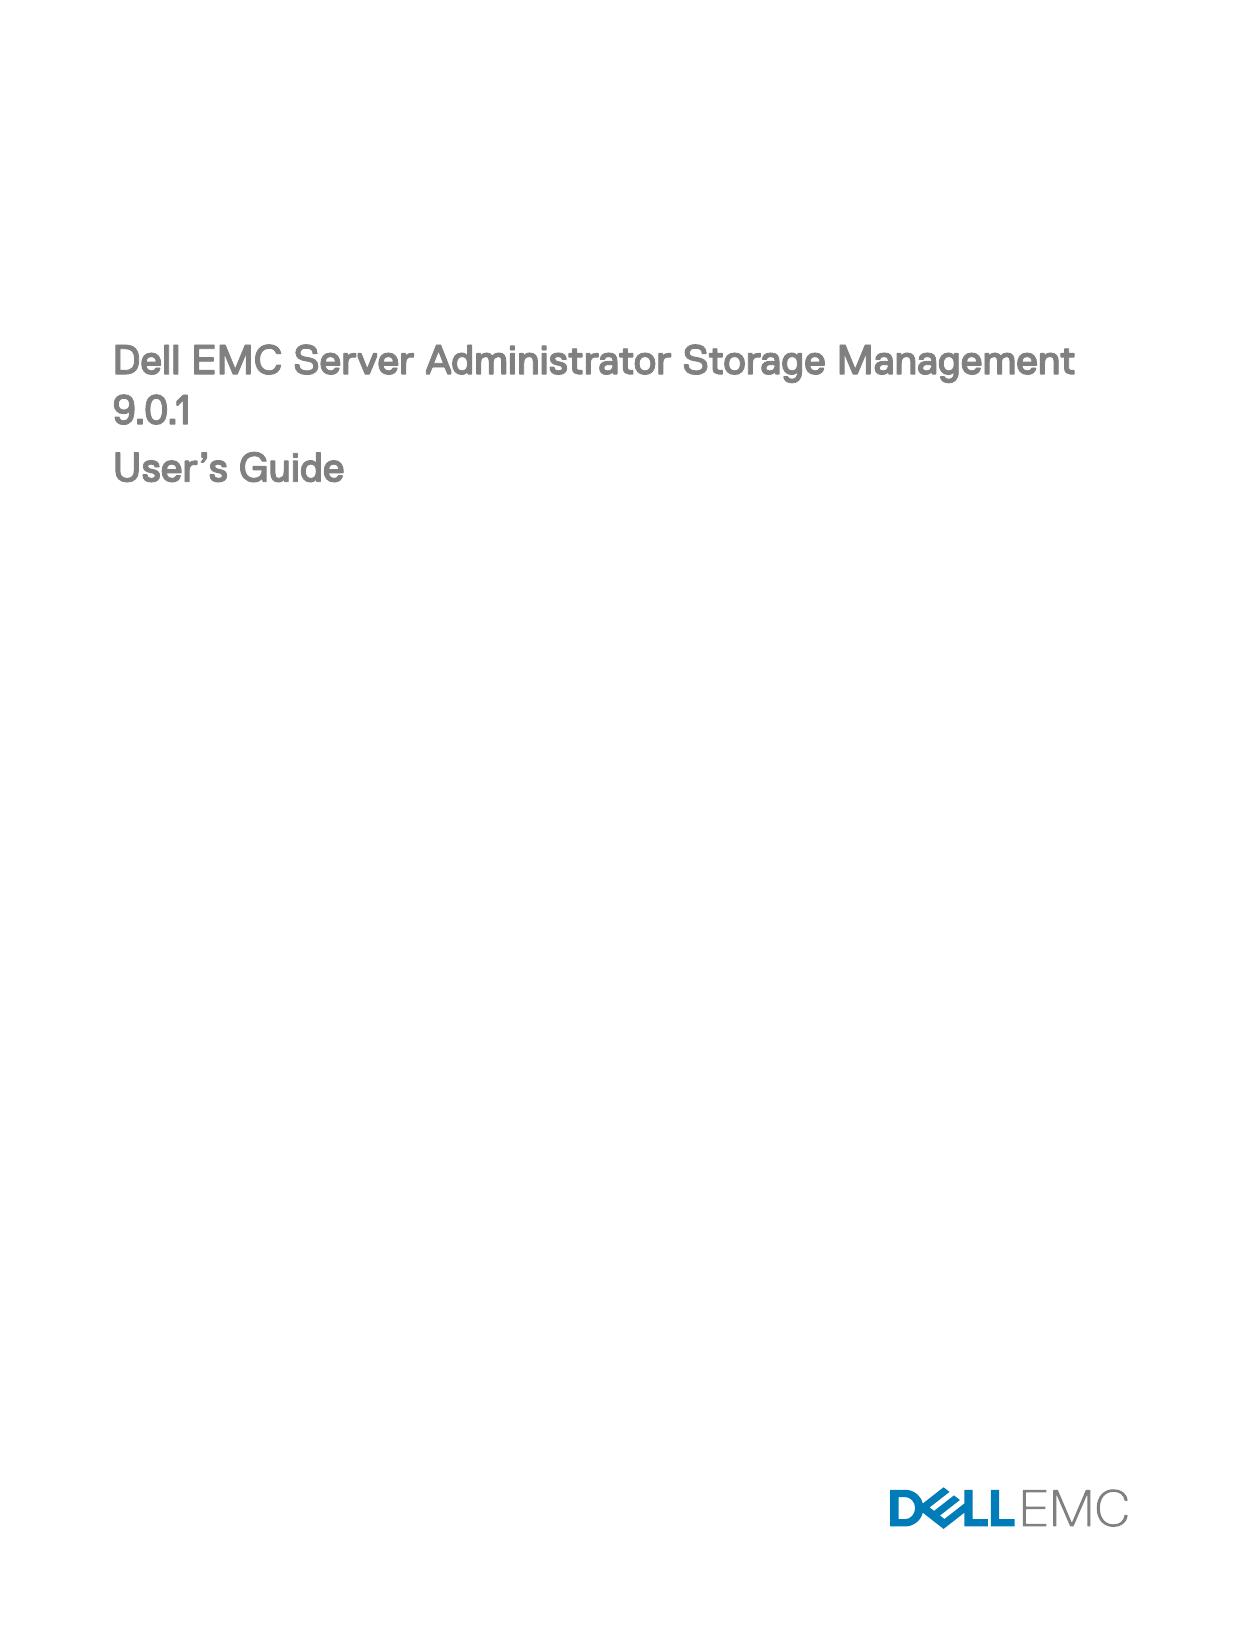 Dell EMC Server Administrator Storage Management 9 0 1 User